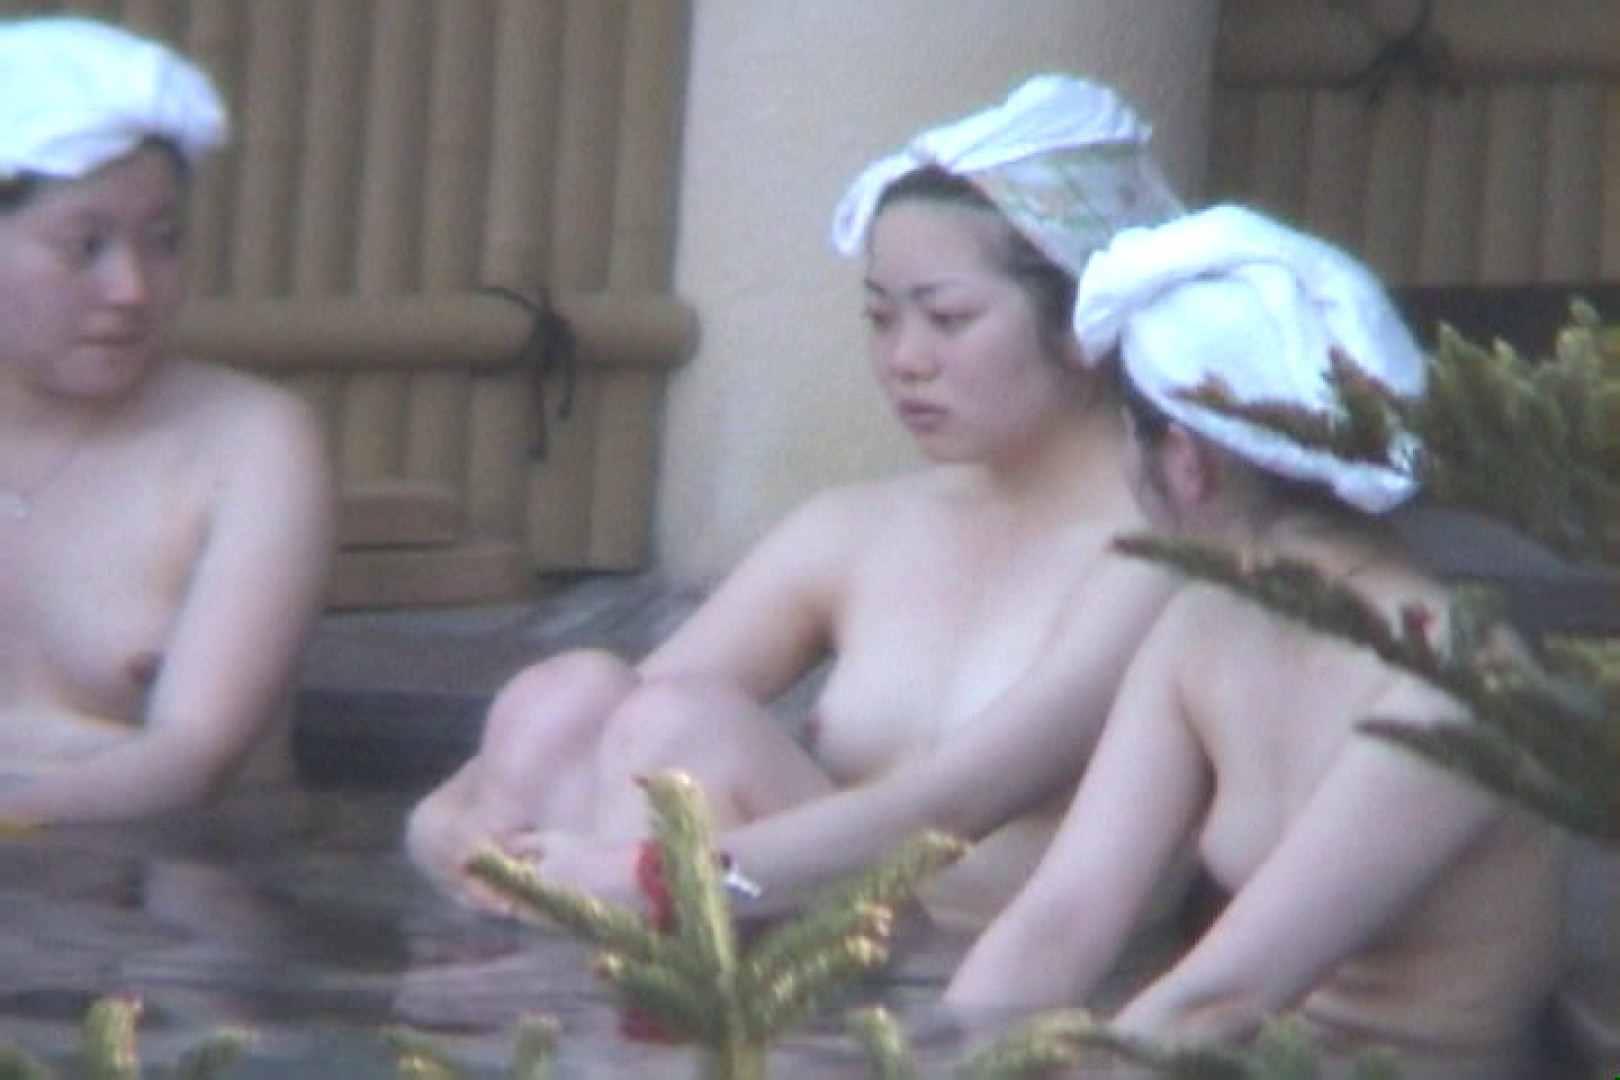 Aquaな露天風呂Vol.86【VIP限定】 0 | 0  48連発 21